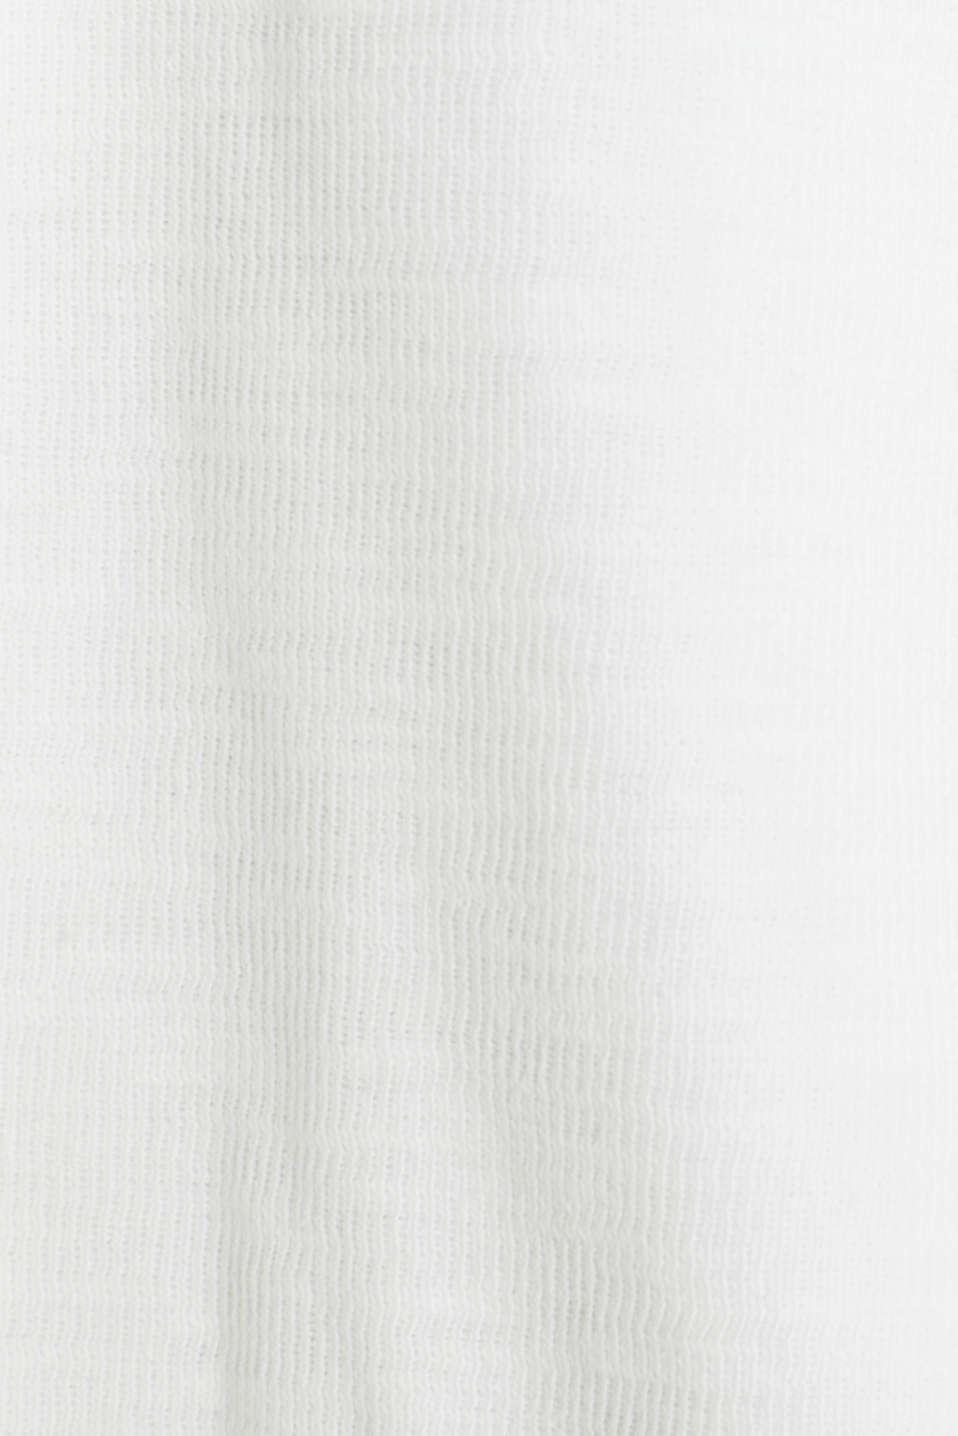 Open short blazer made of melange knit fabric, WHITE, detail image number 4